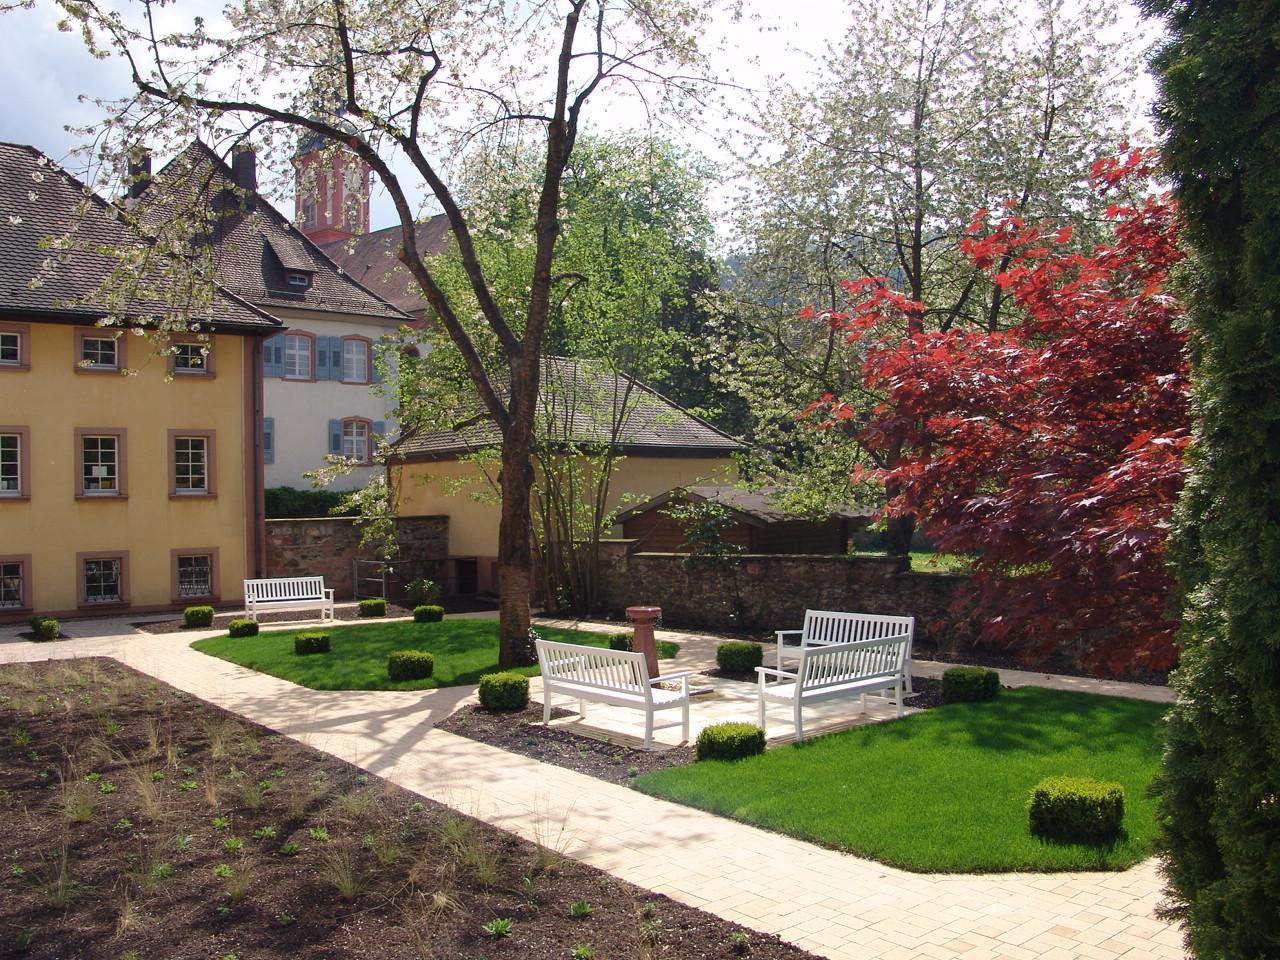 Garten der Sozialstation